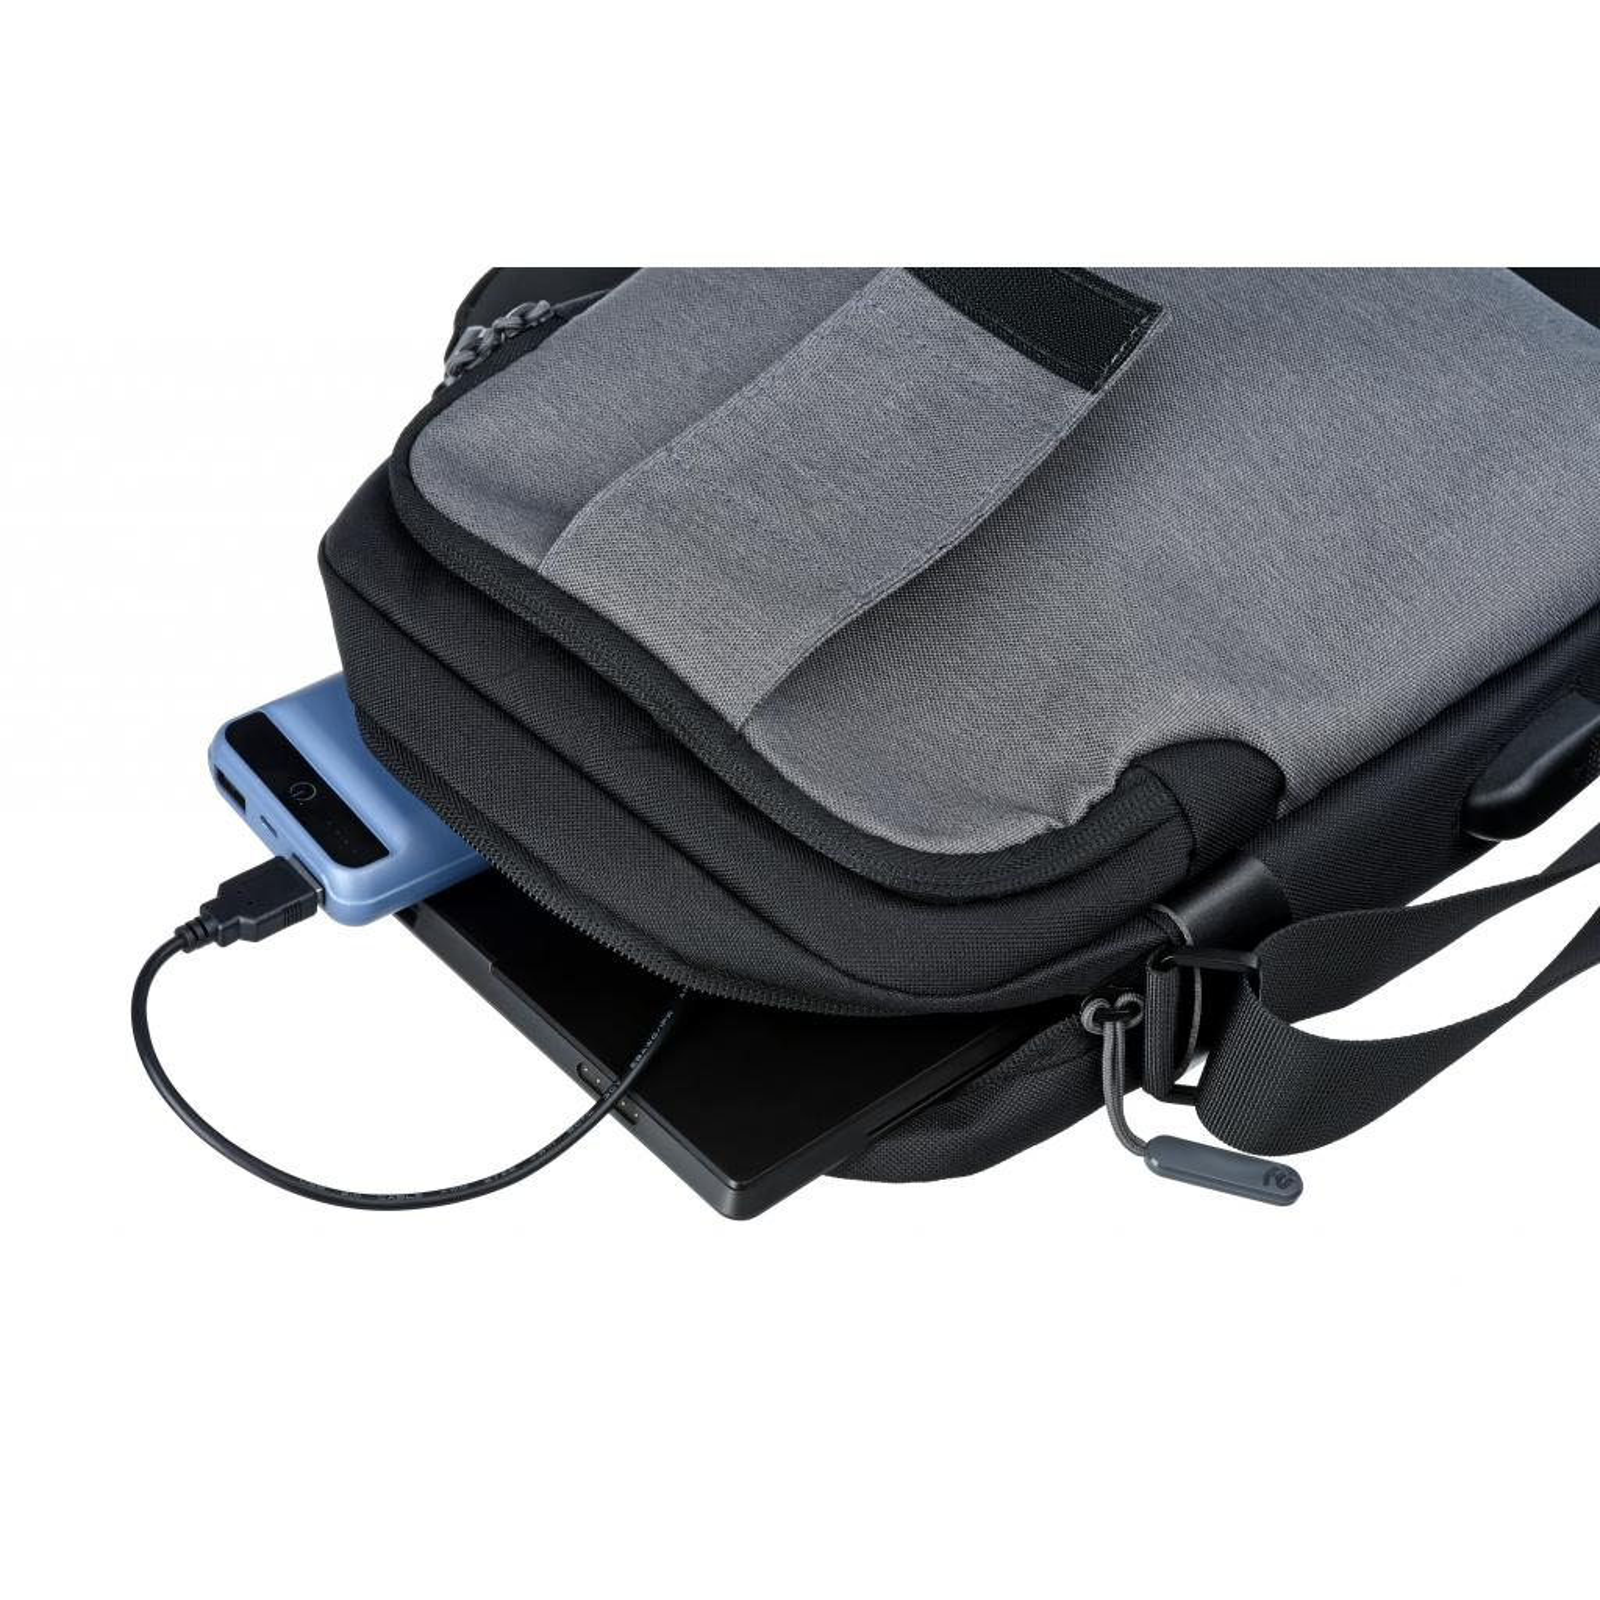 "Сумка для ноутбука 2E 10"" Supreme, Grey (2E-TBT9180BK) зображення 10"